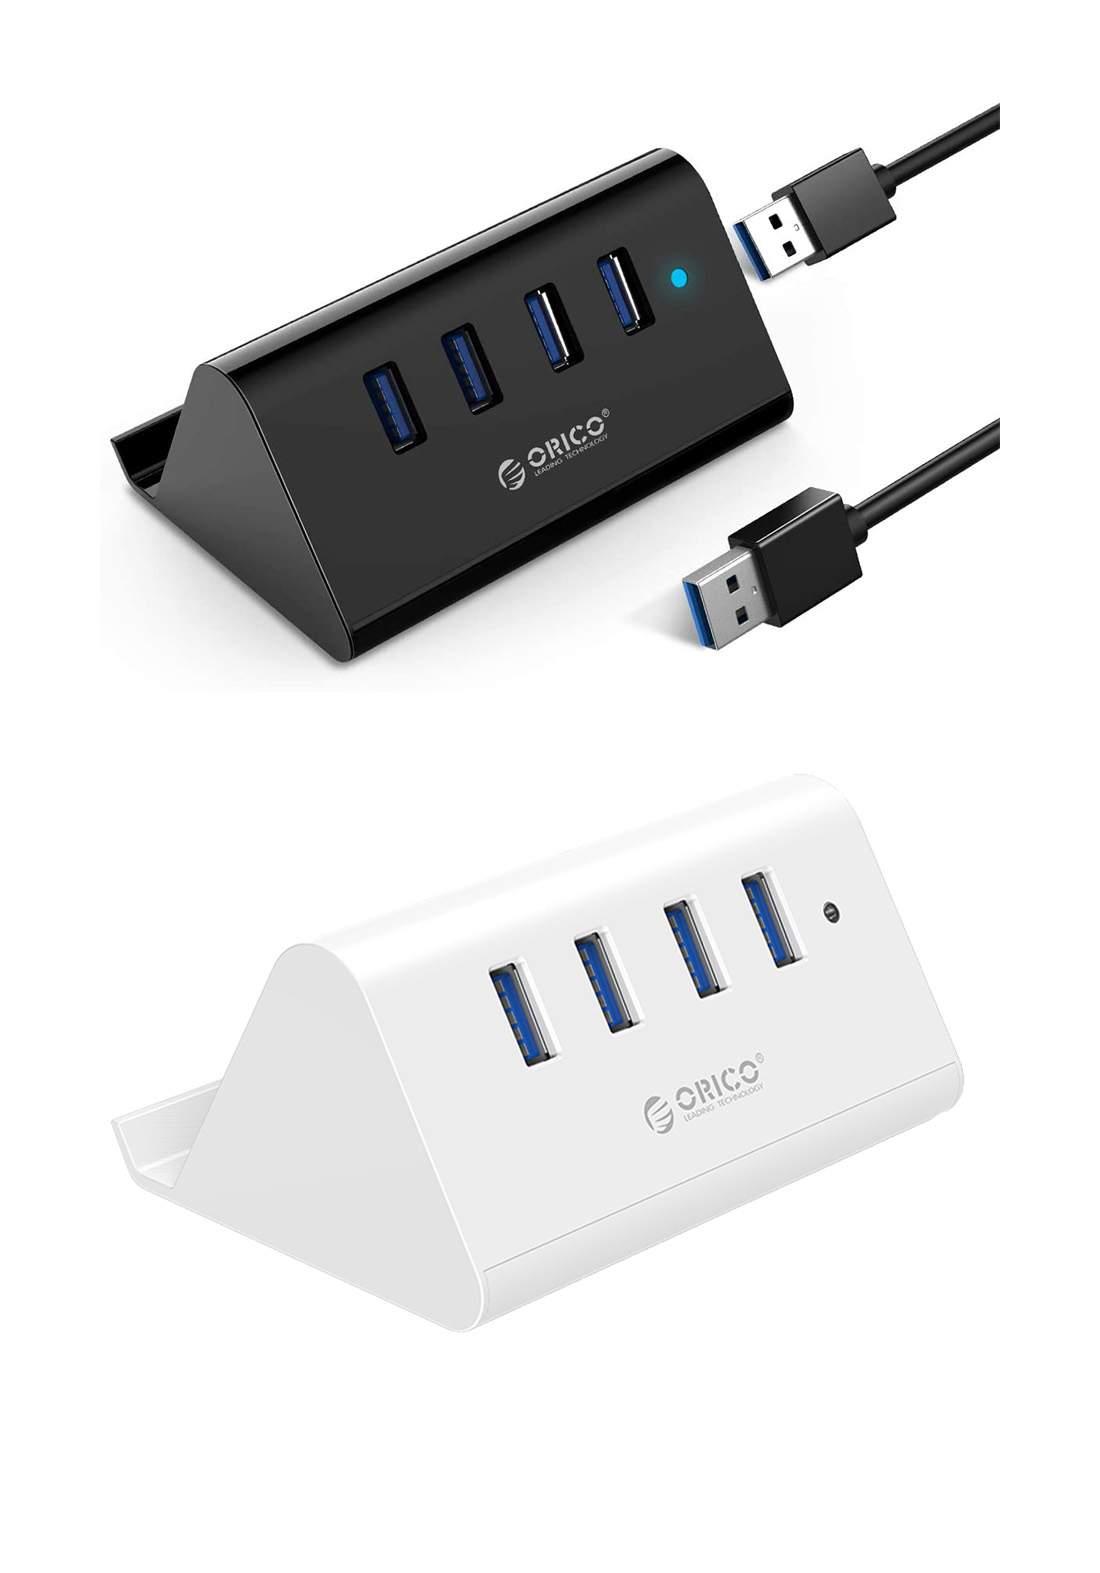 Orico Black SHC-U3 4 Port USB3 HUB With Phone & Tablet Stand